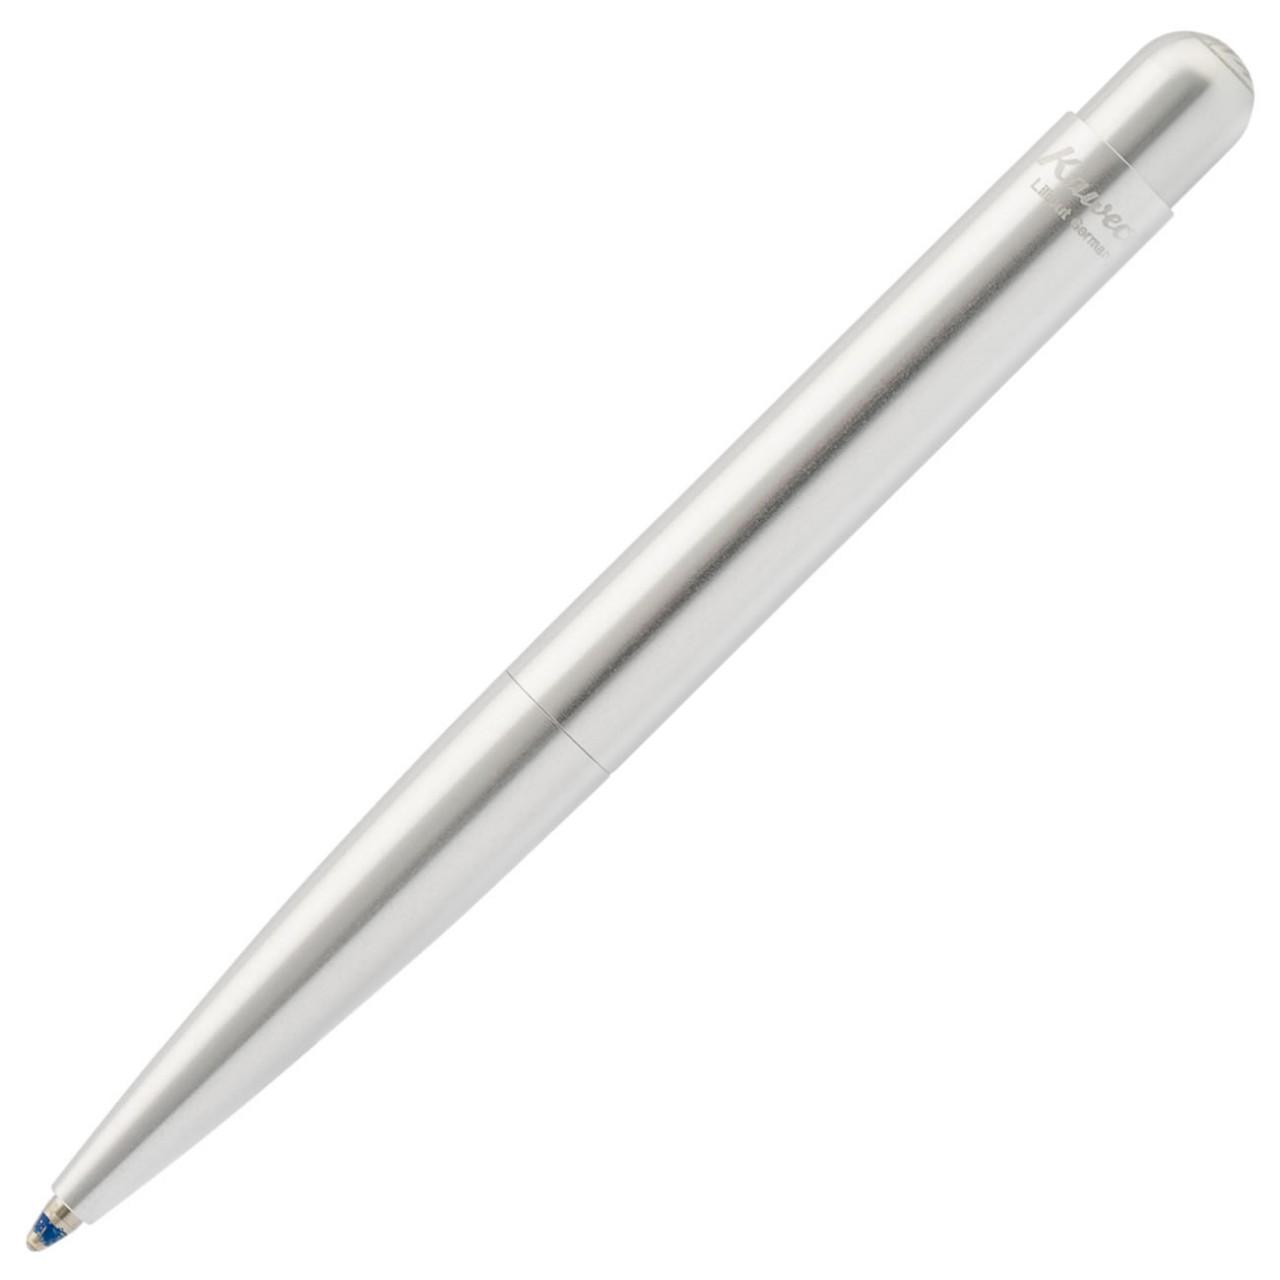 Kaweco LILIPUT Al silber Kugelschreiber